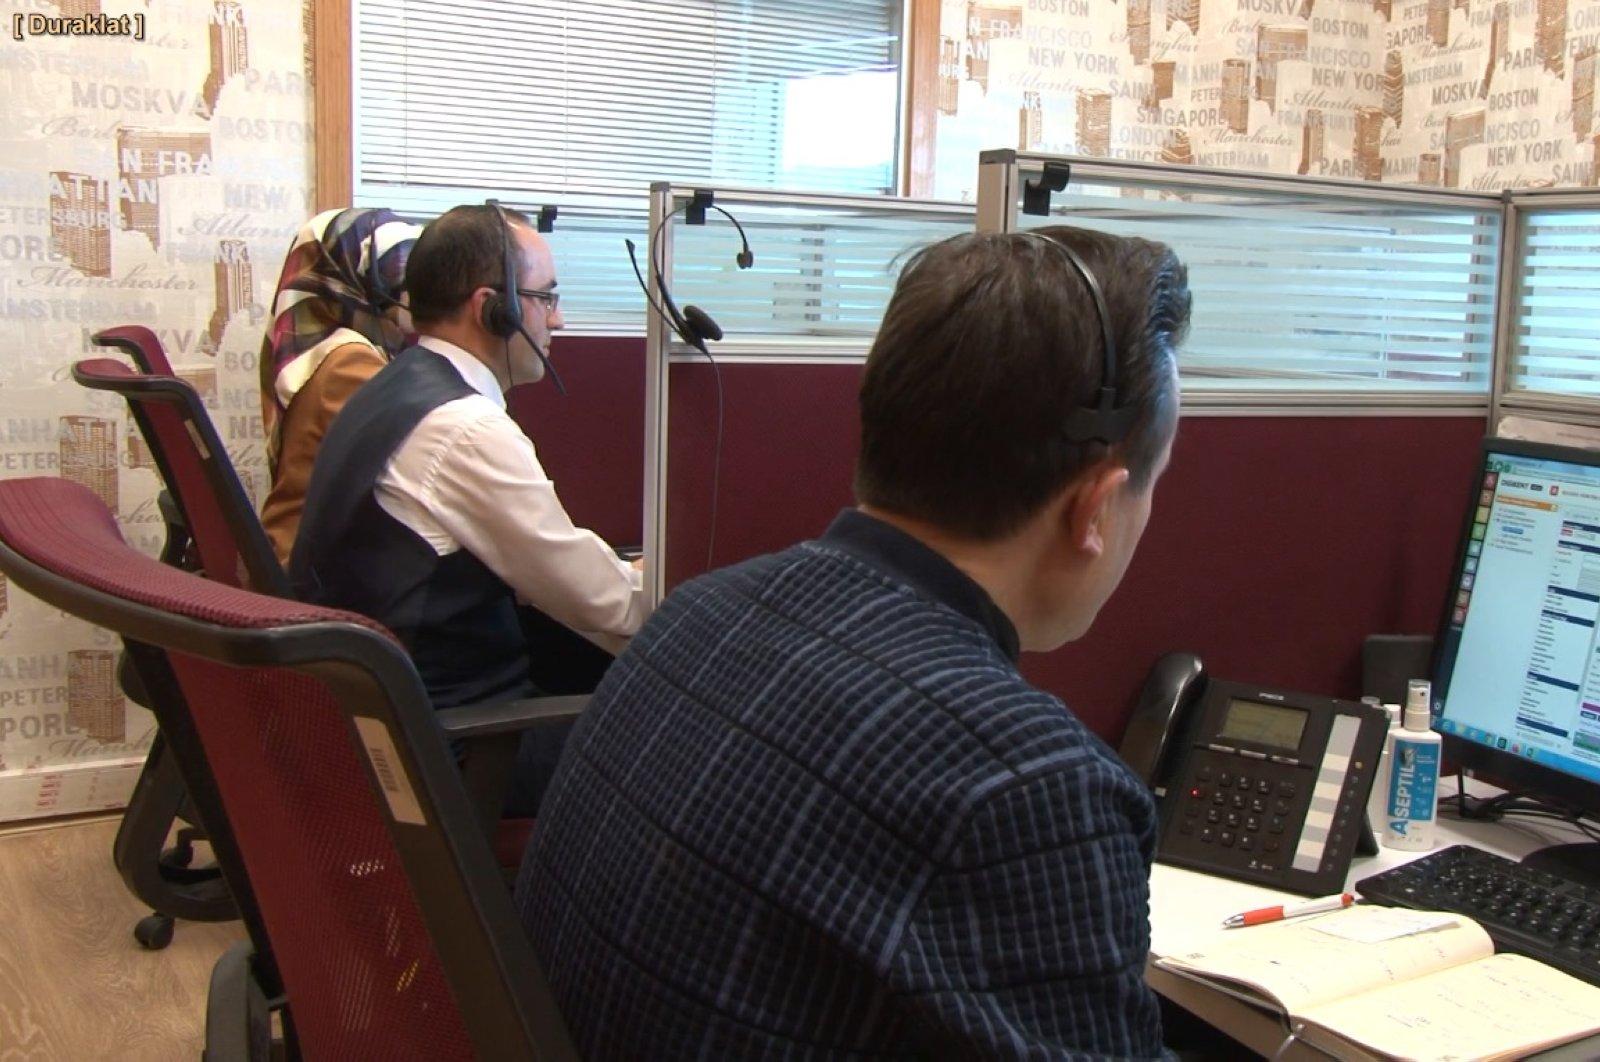 Civil servants working in a coronavirus hotline in Istanbul's Tuzla (DHA File Photo)